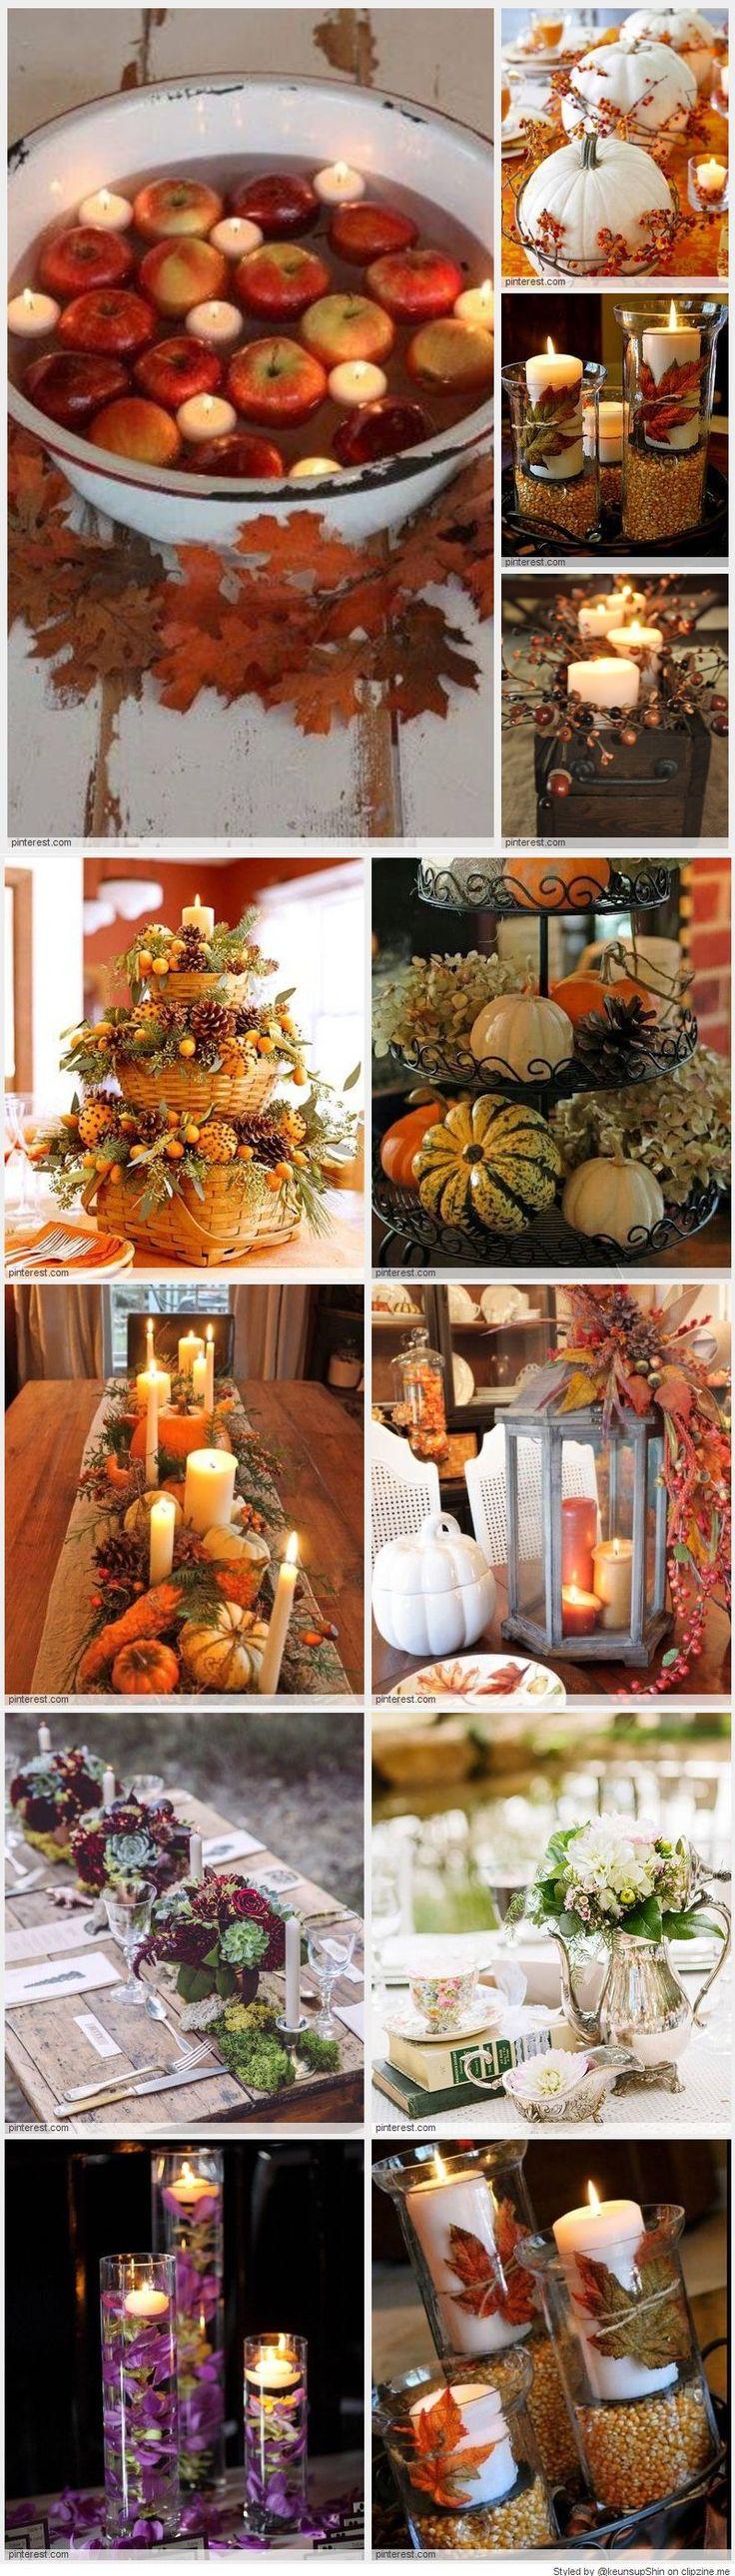 Fabulous Fall Centerpieces ★❤★ Trending • Fashion • DIY • Food • Decor • Lifestyle • Beauty • Pinspiration ✨ @Concierge101.com